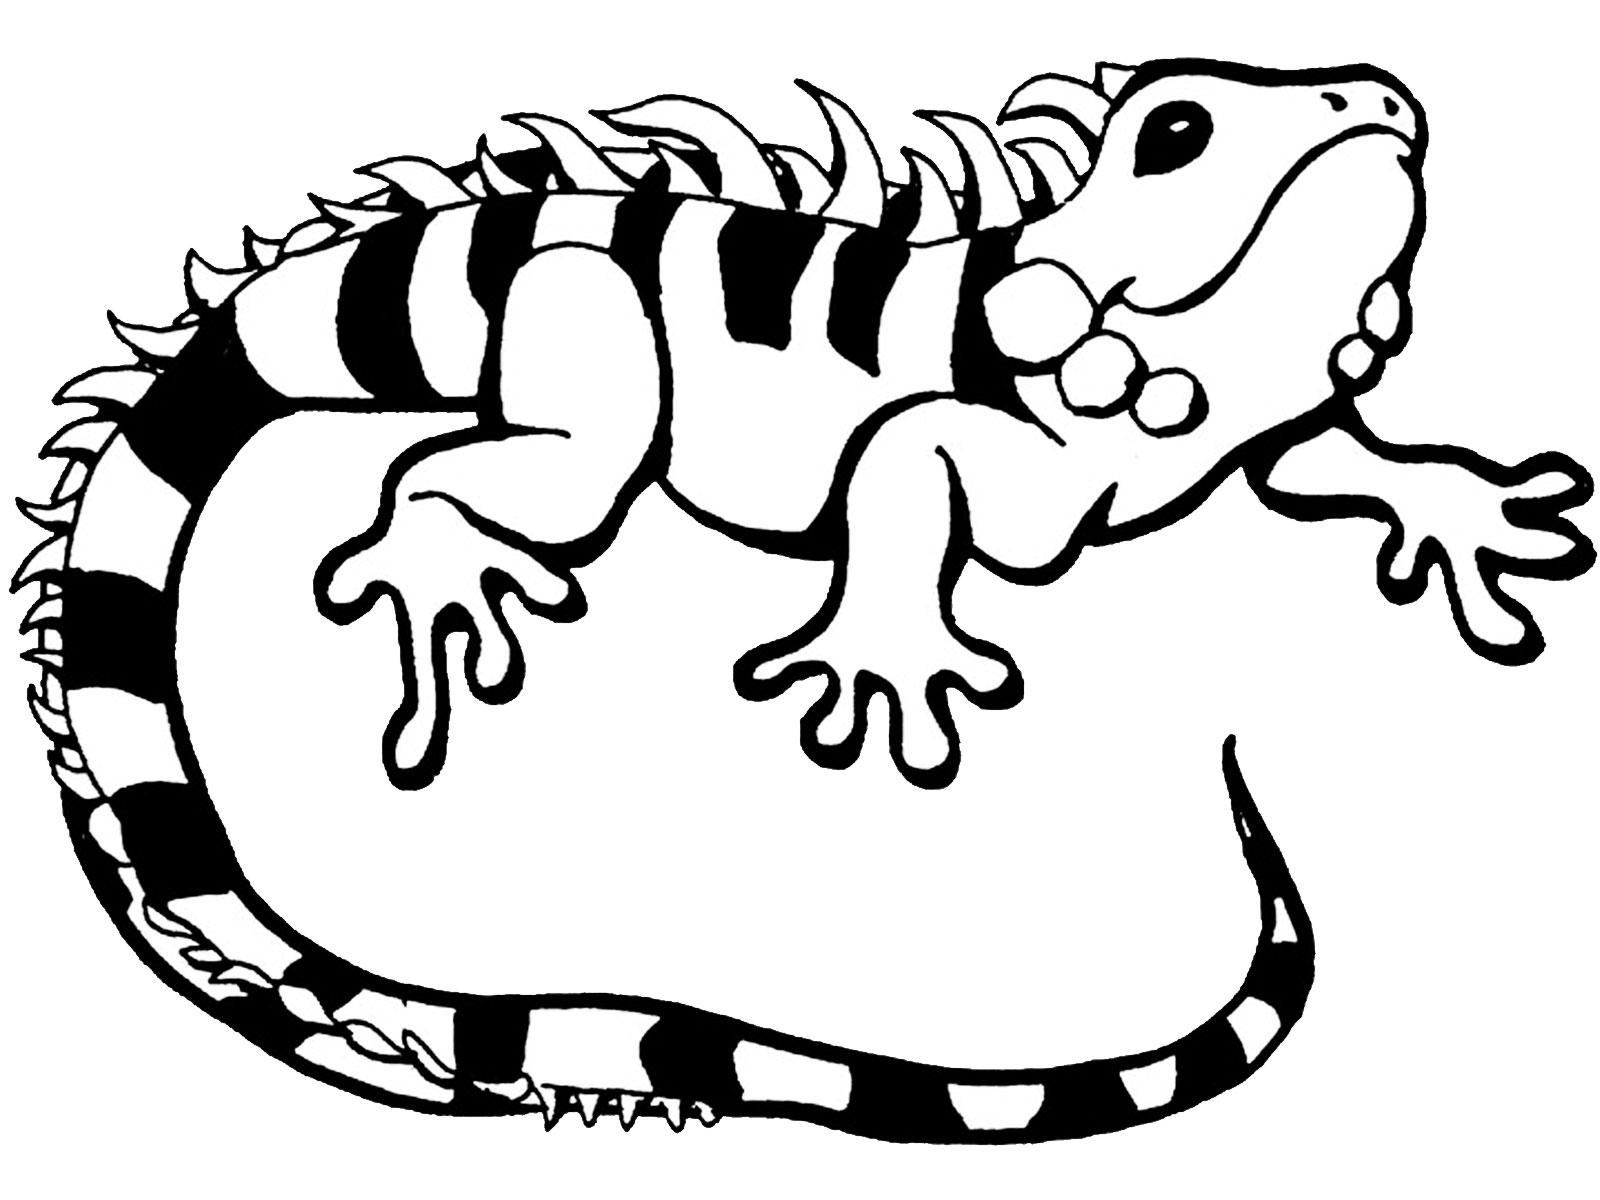 1600x1200 Fabulous Gecko Coloring Pages Almost Unique Article Cute Iguana